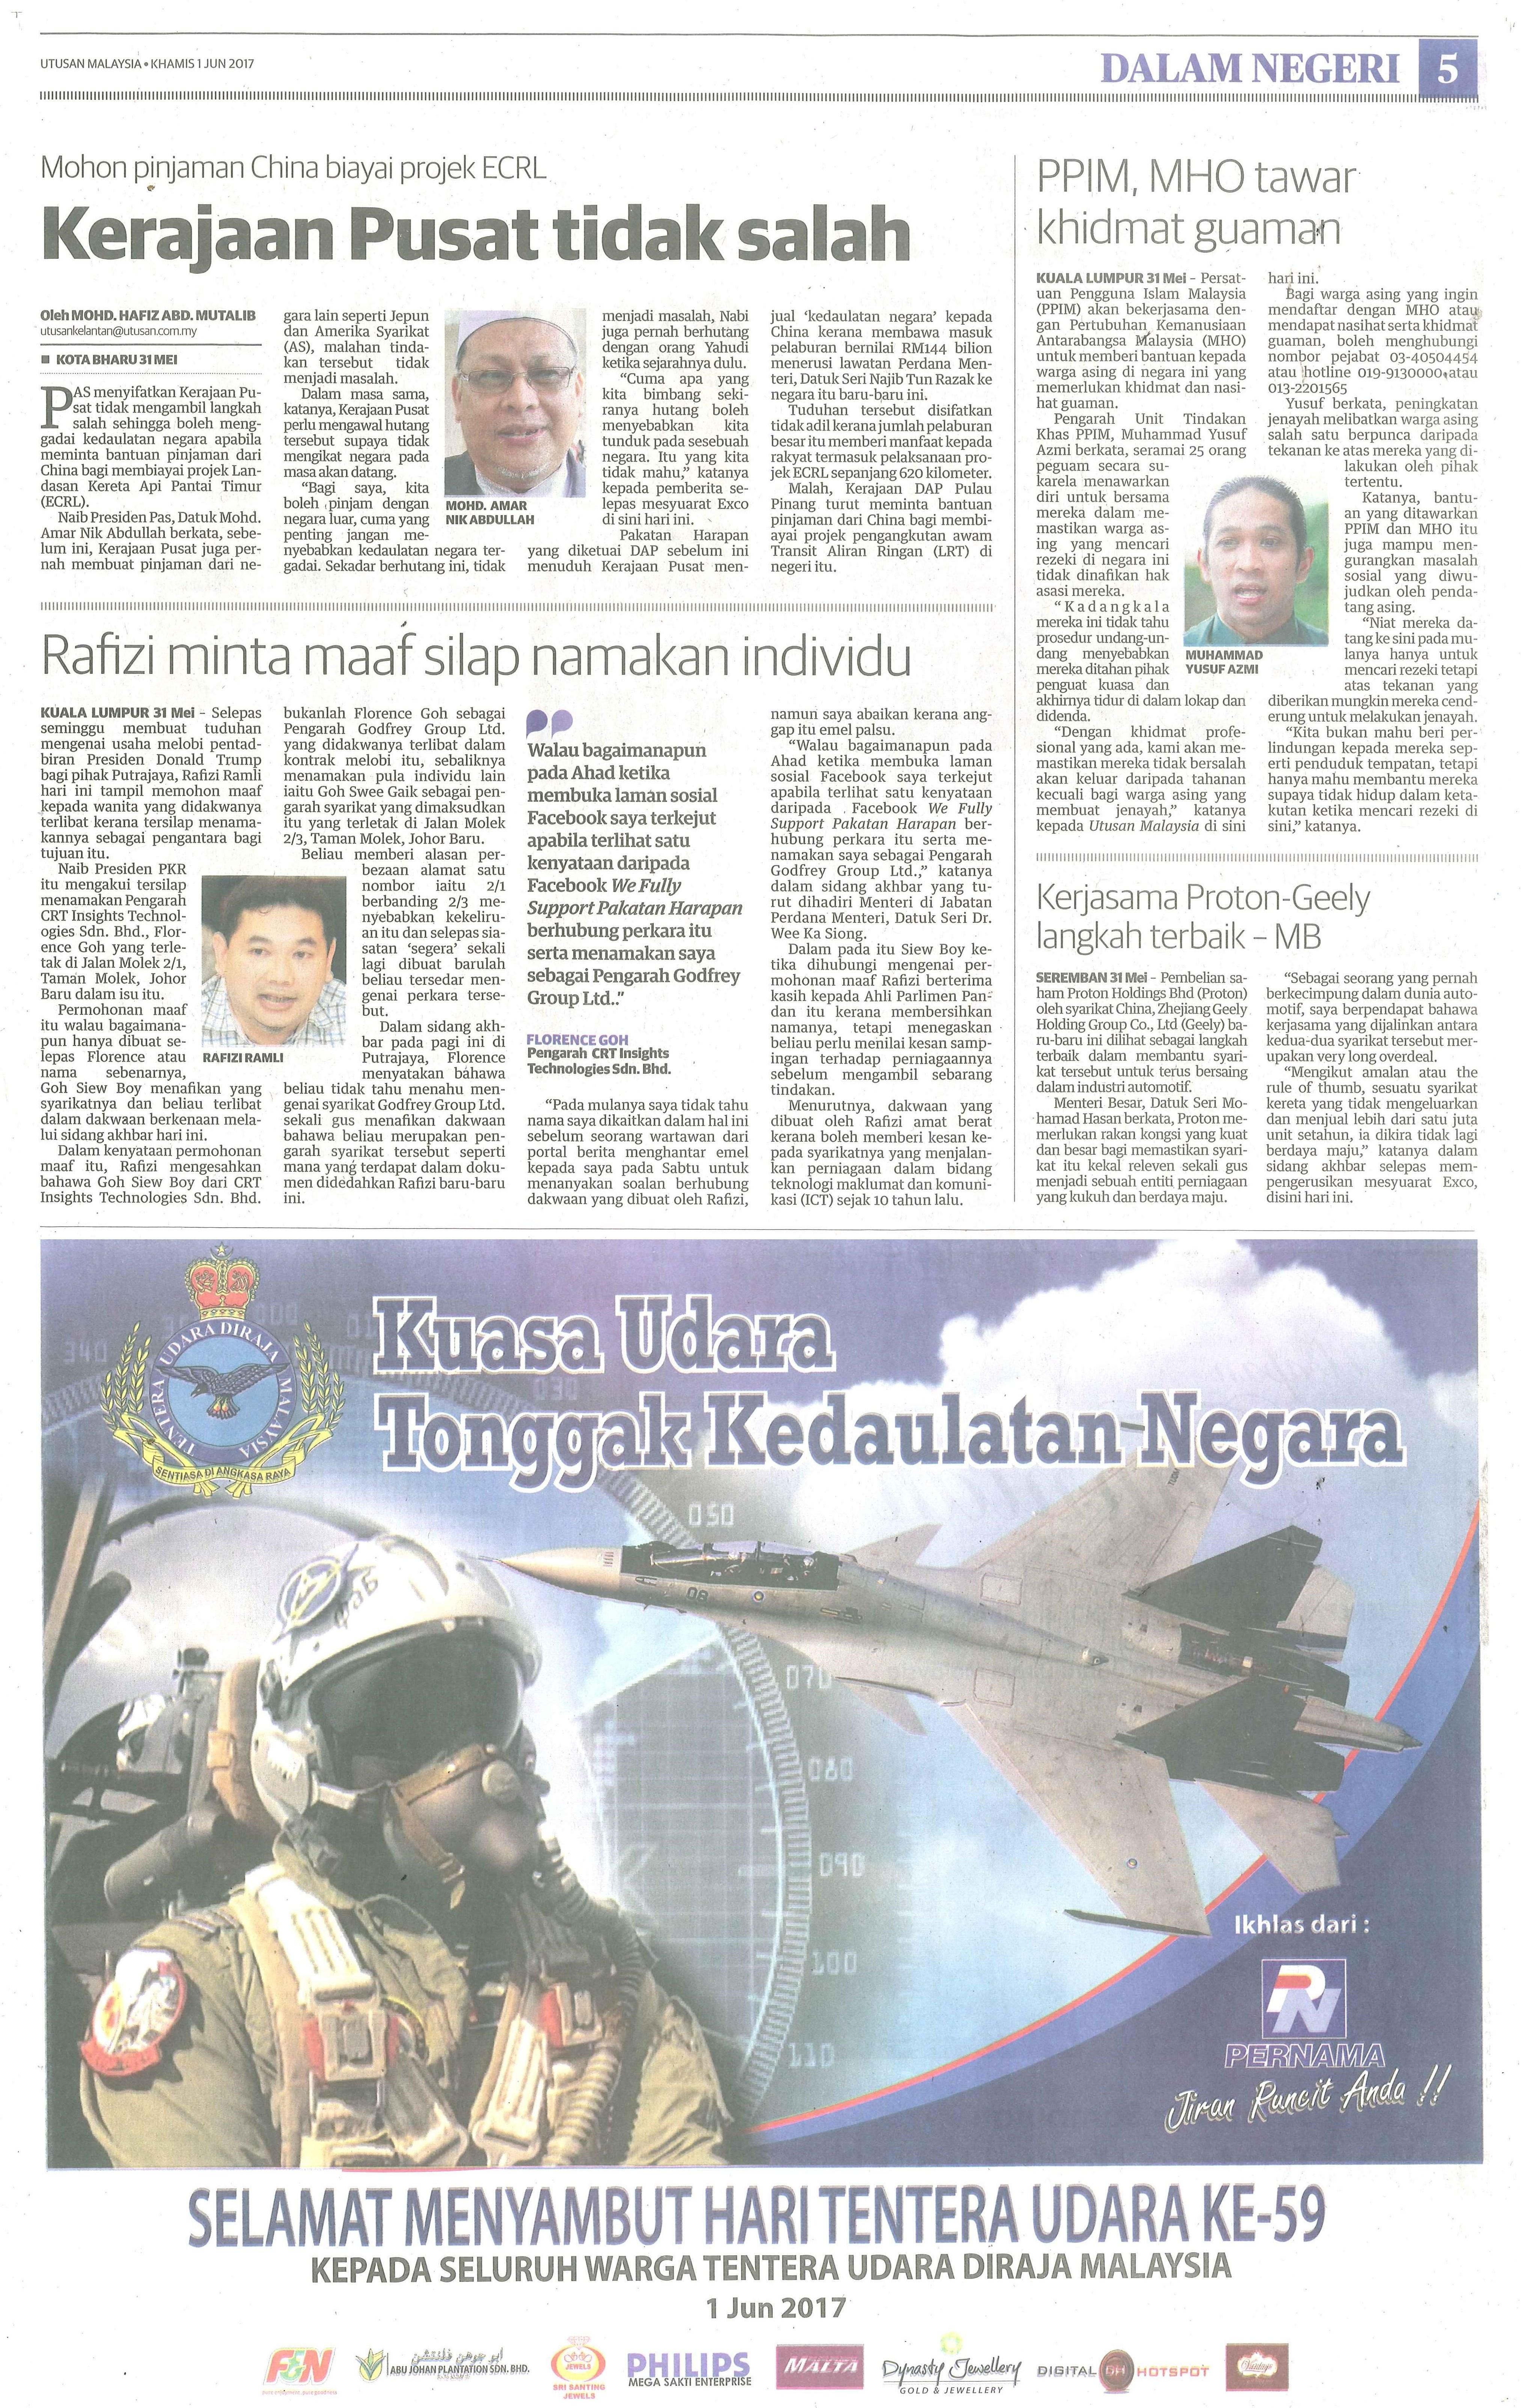 utusan malaysia 1.6.2017